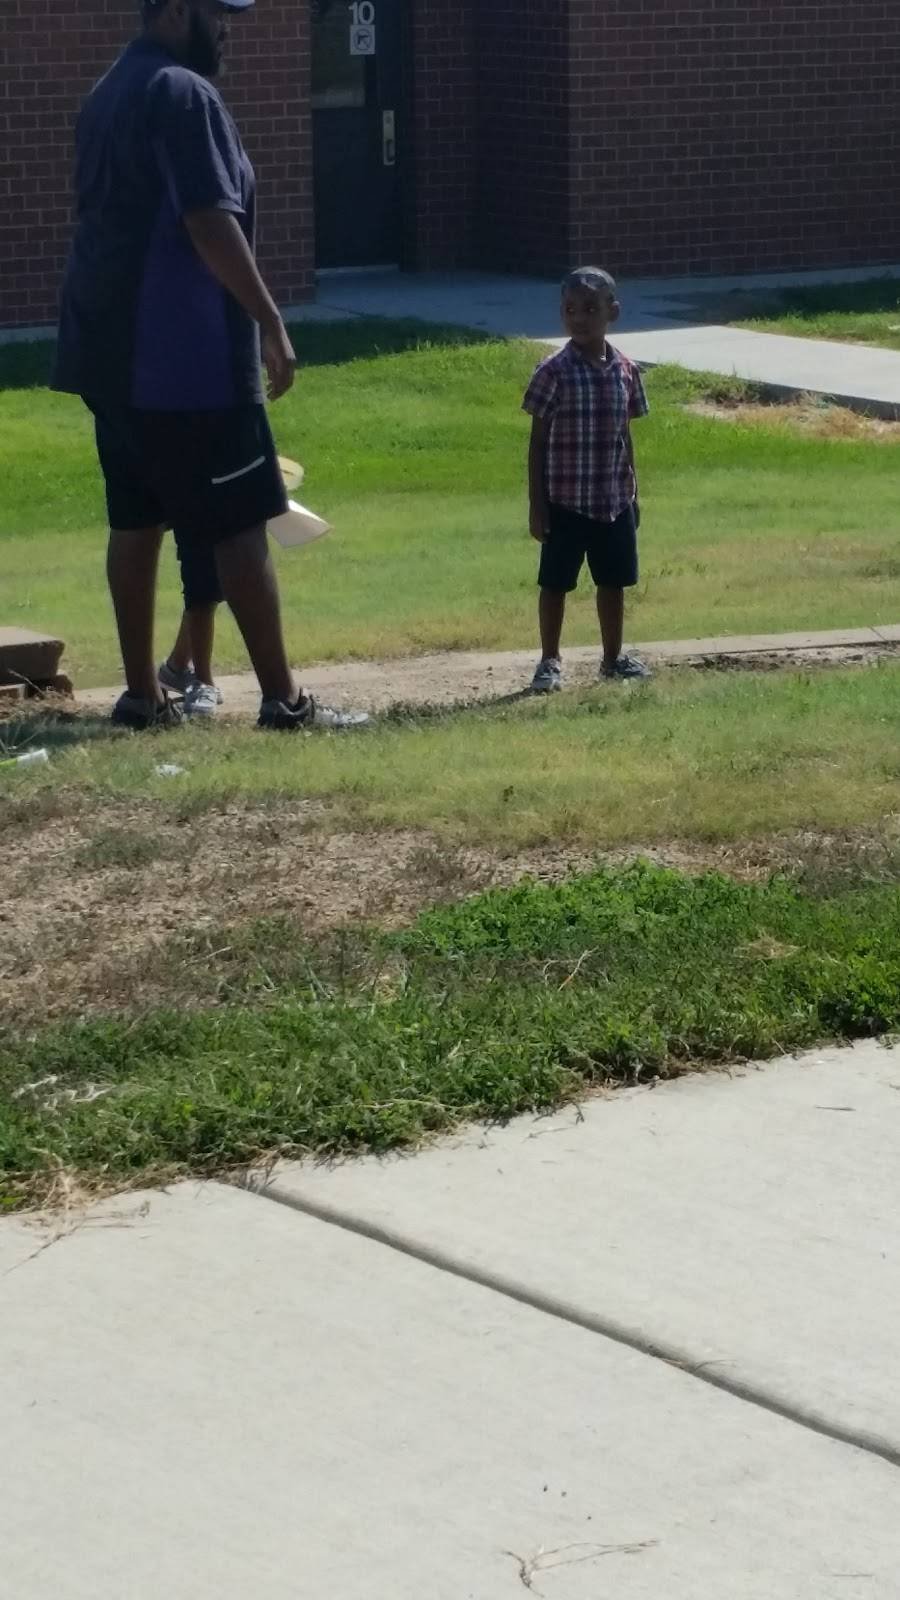 Lynette Woodard Park - park    Photo 5 of 9   Address: 2750 E 18th St N, Wichita, KS 67214, USA   Phone: (316) 303-8015